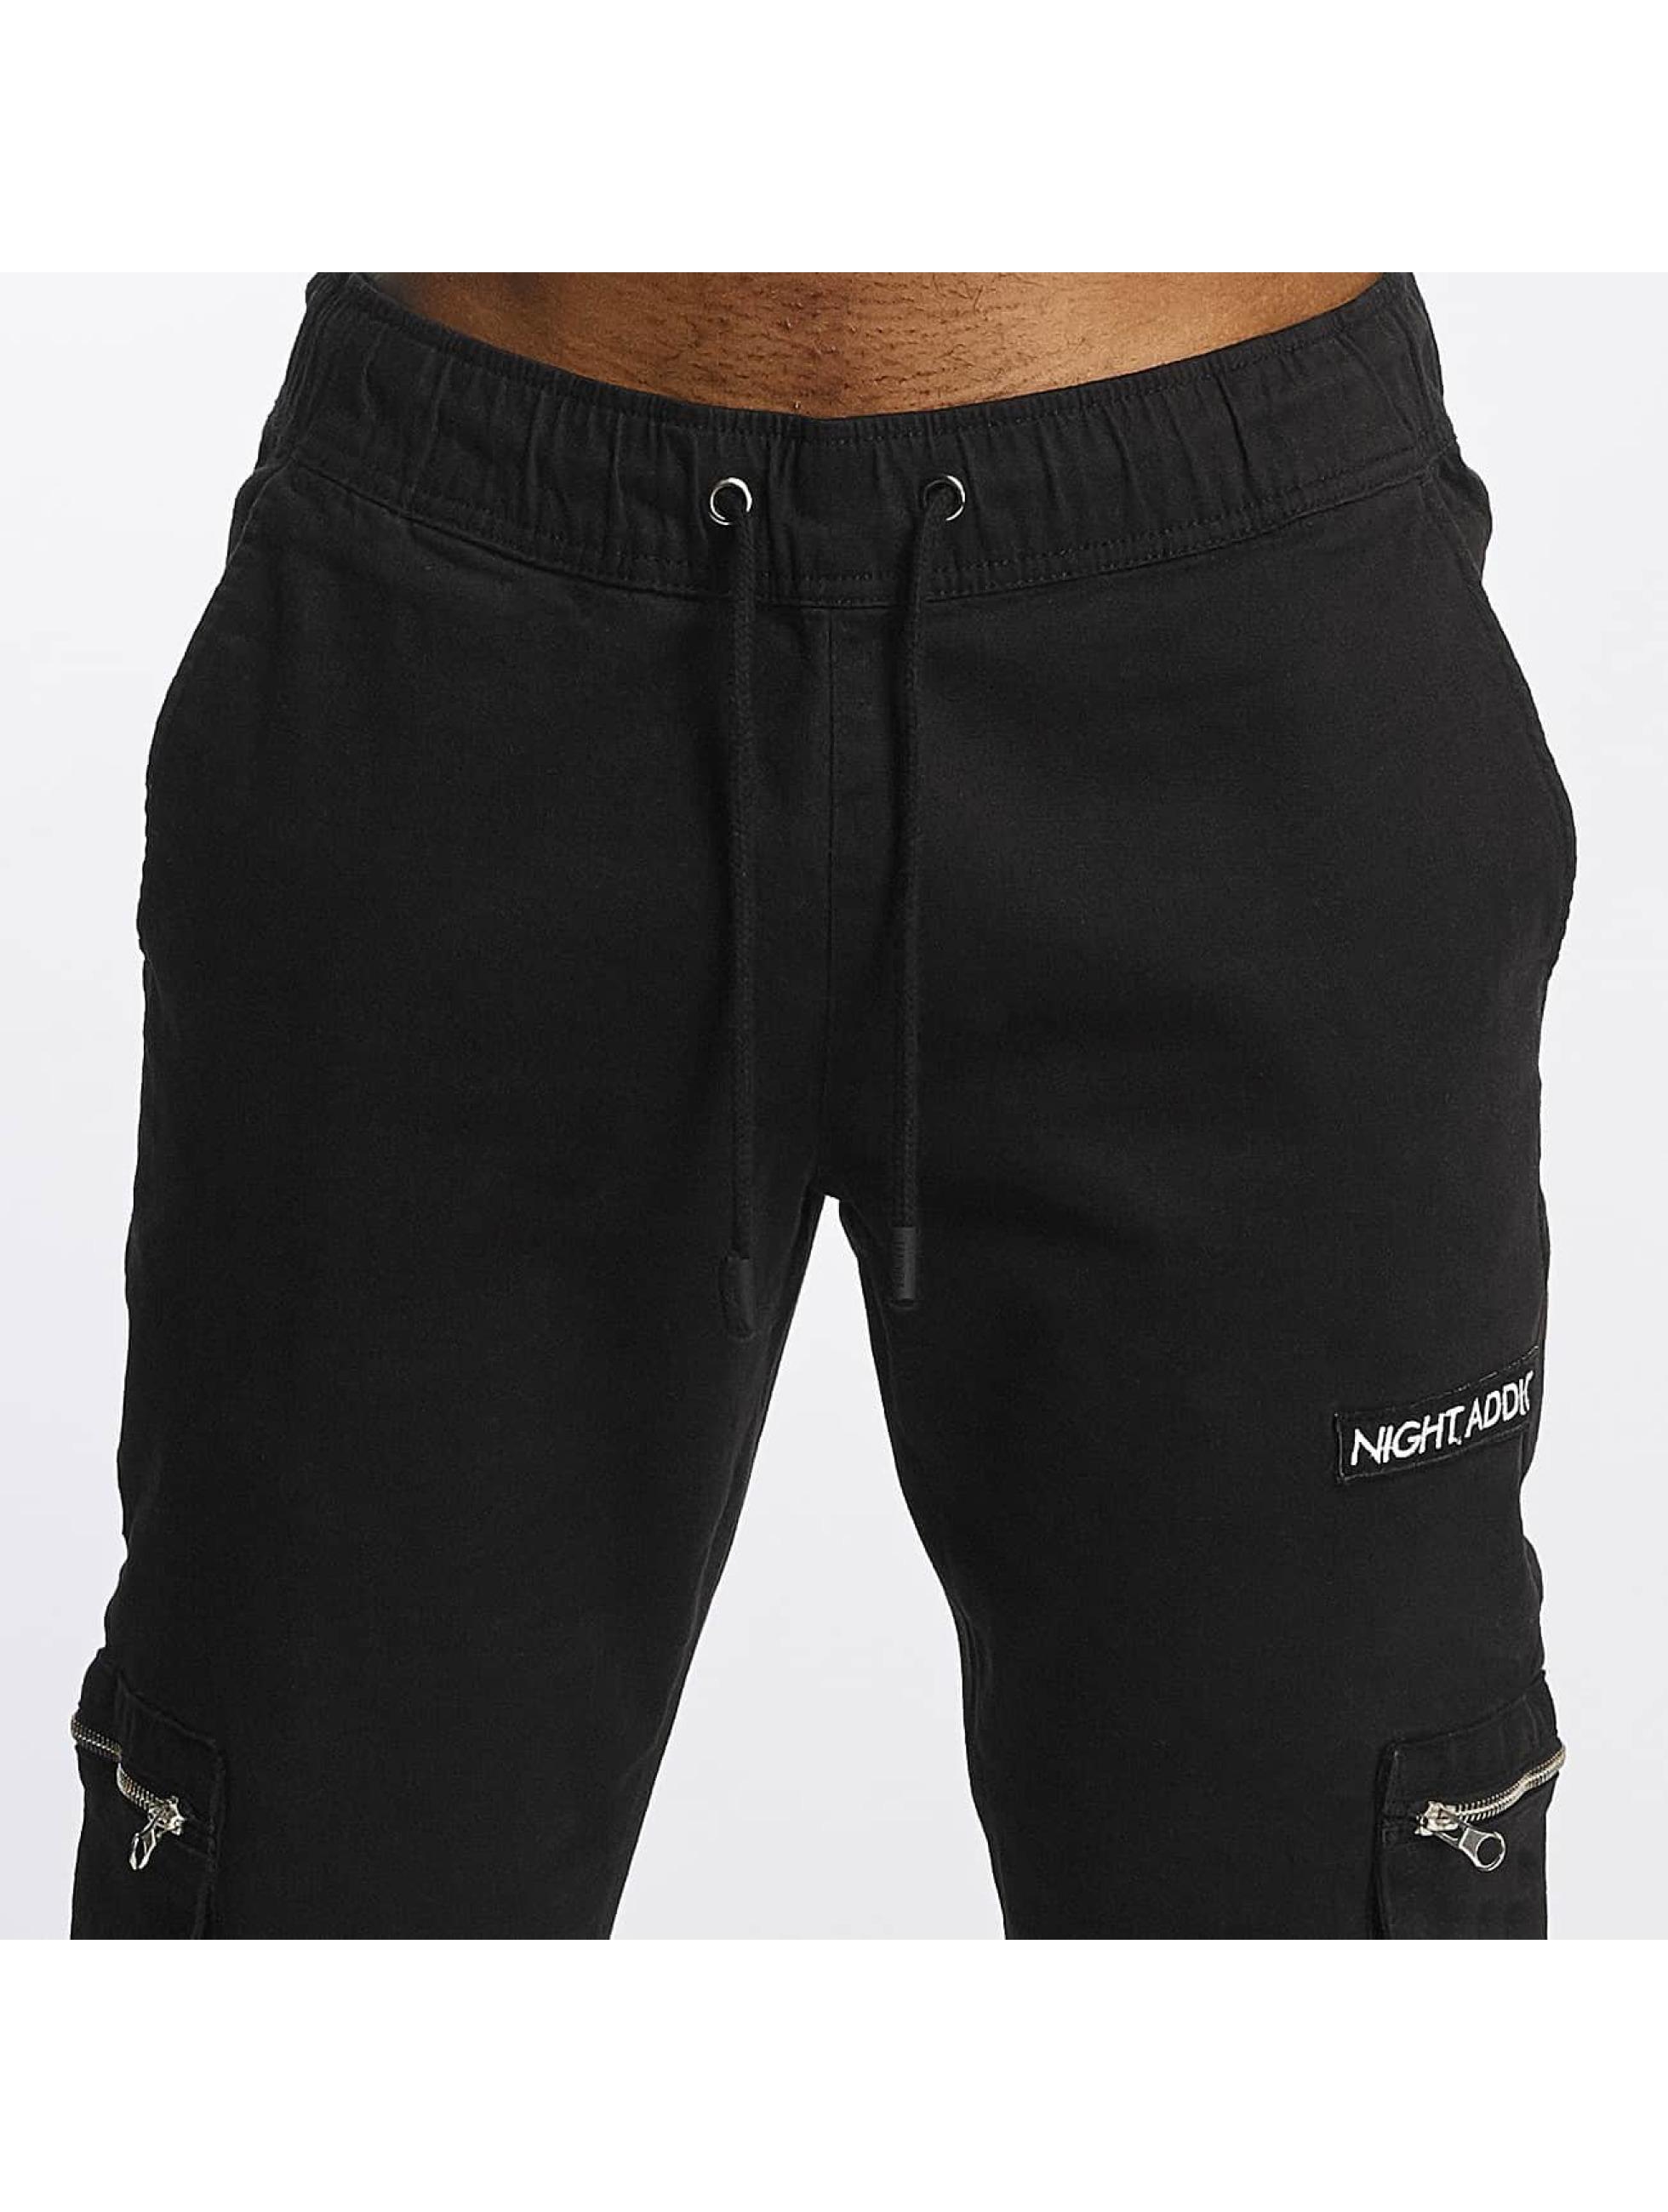 Brave Soul Pantalon cargo Night Addict noir